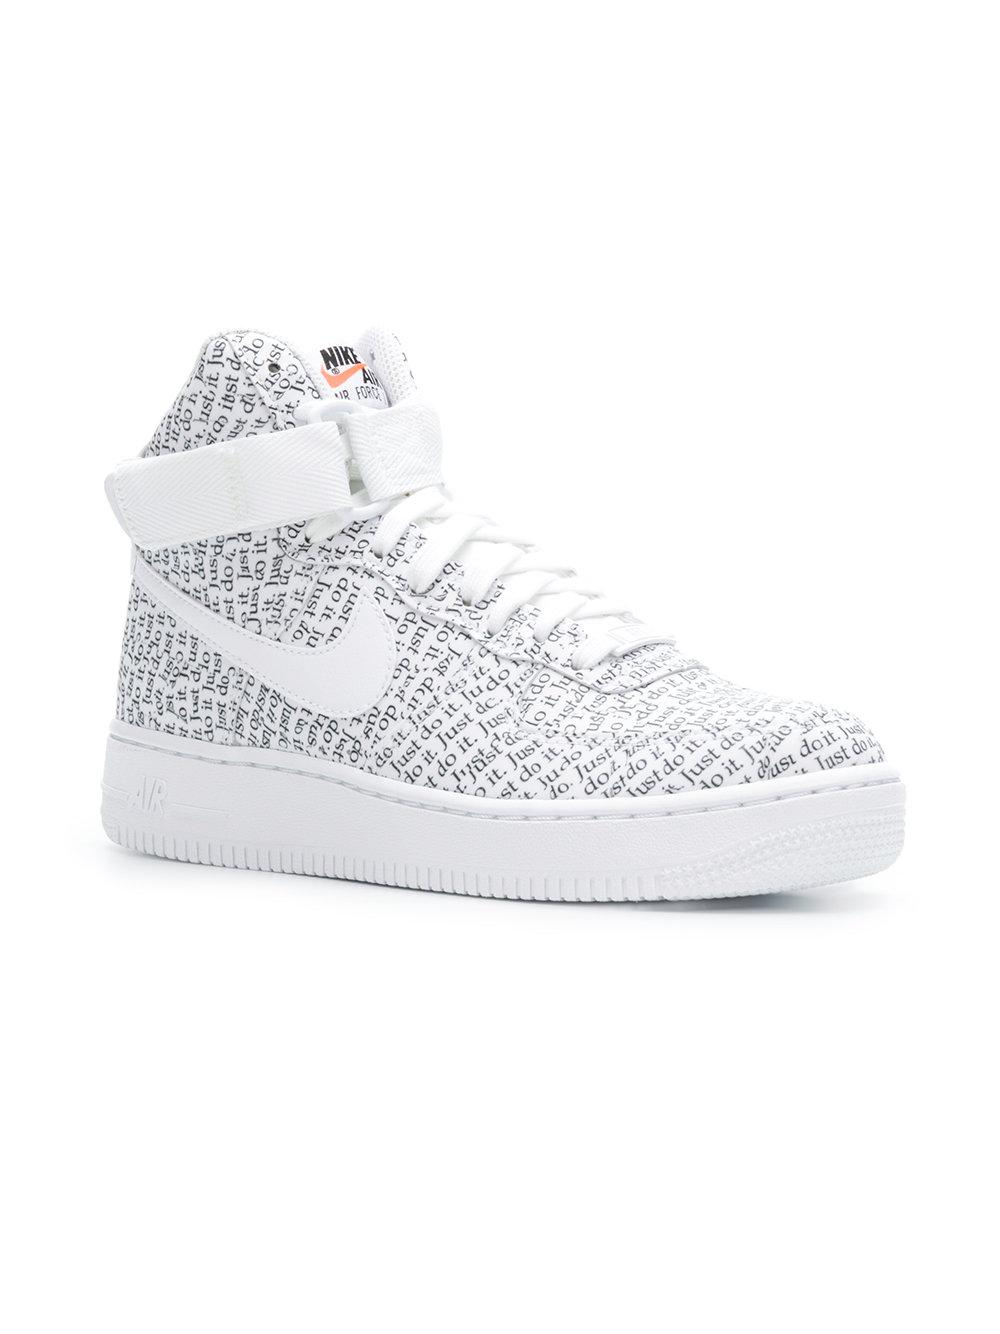 16a5b1ea72d Lyst - Nike Air Force 1 Hi-top Sneakers in White